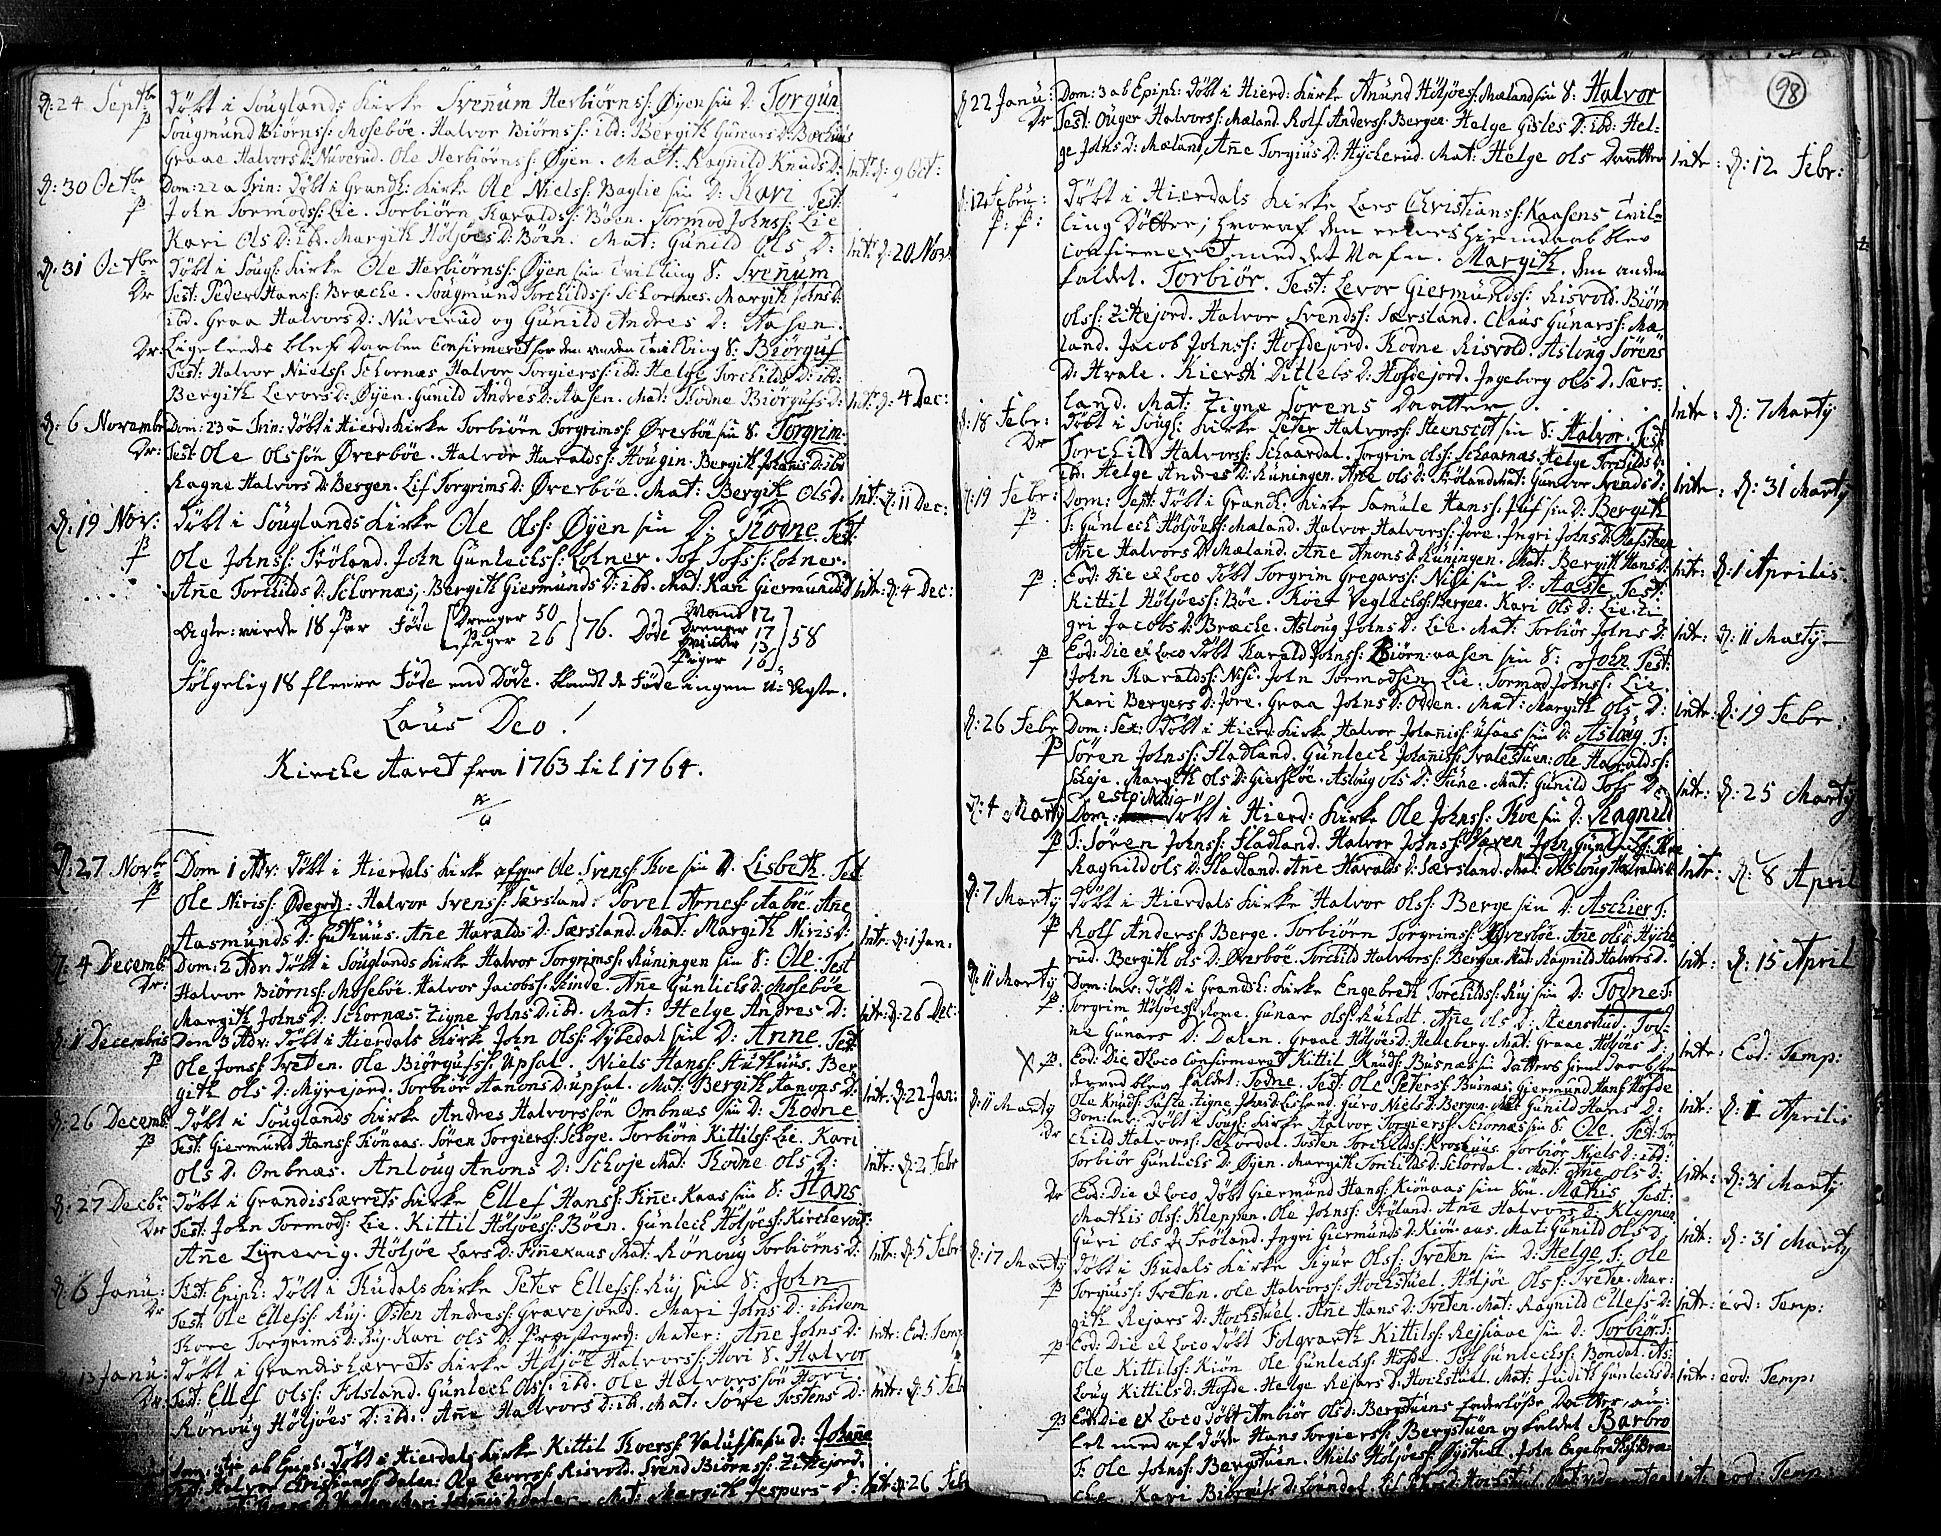 SAKO, Hjartdal kirkebøker, F/Fa/L0003: Ministerialbok nr. I 3, 1727-1775, s. 98